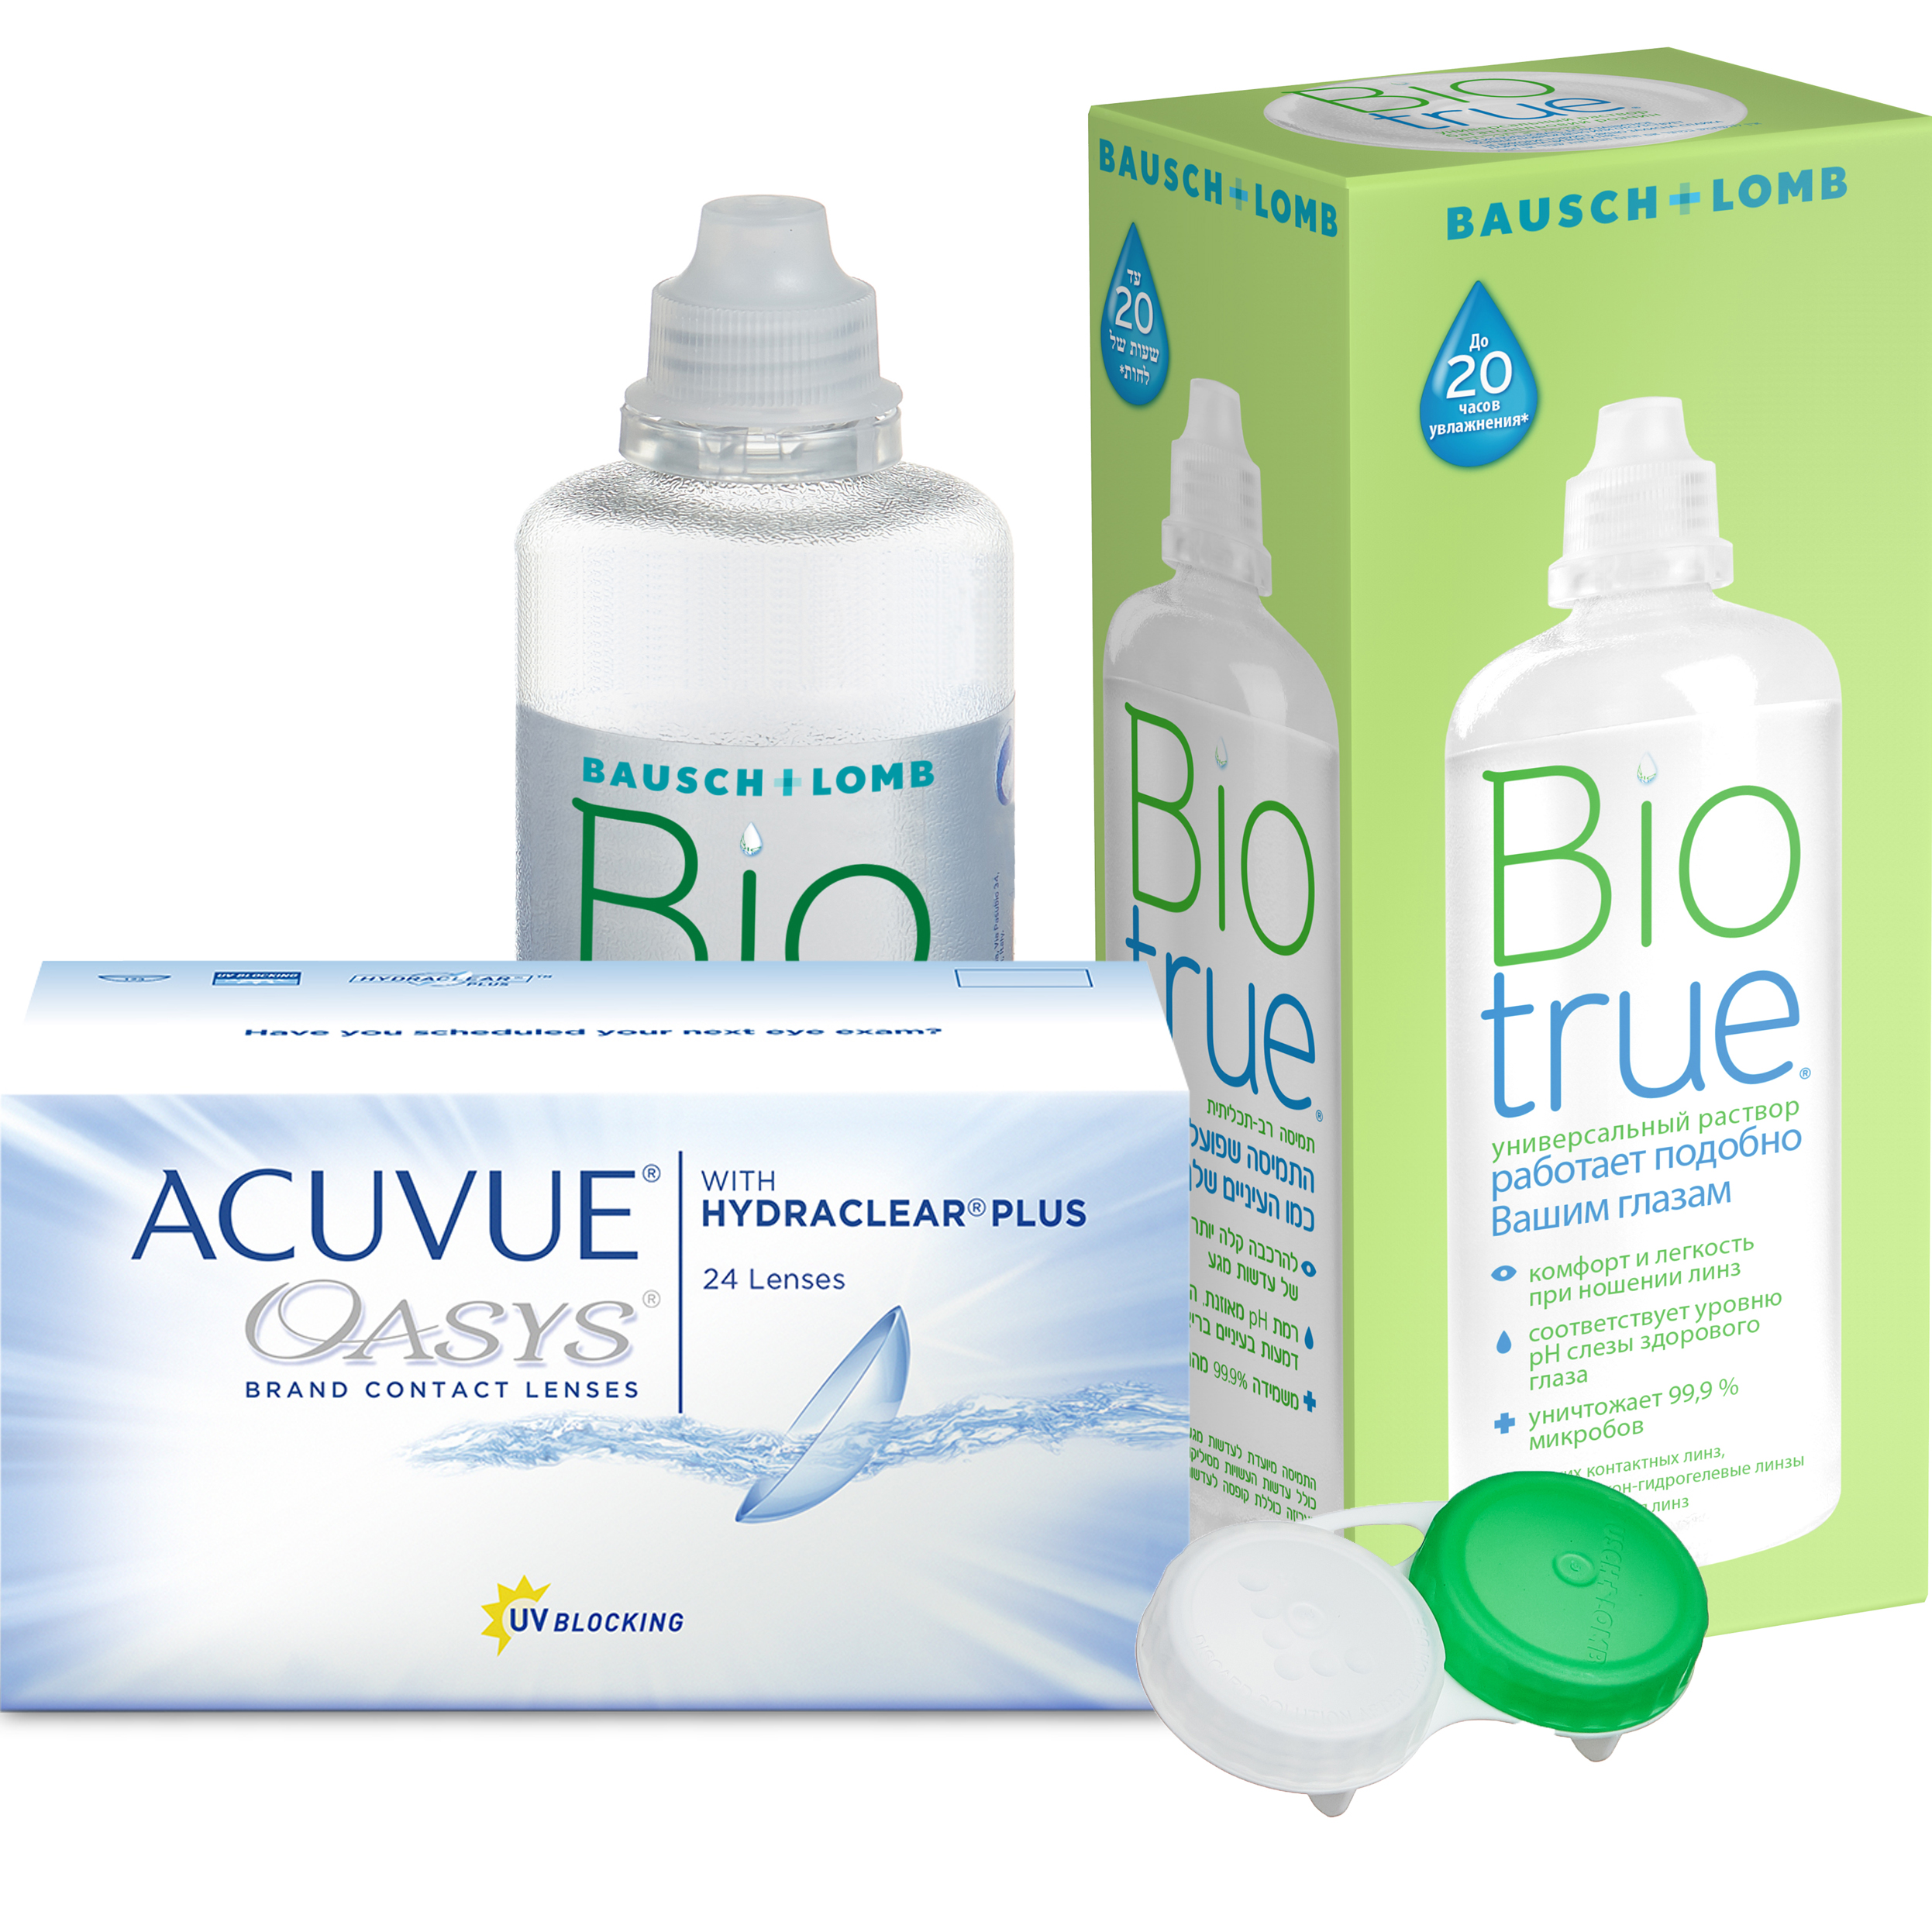 Купить Oasys with Hydraclear Plus 24 линзы + Biotrue, Контактные линзы Acuvue Oasys with Hydraclear Plus 24 линзы R 8.4 -5, 25 + Biotrue 300 мл